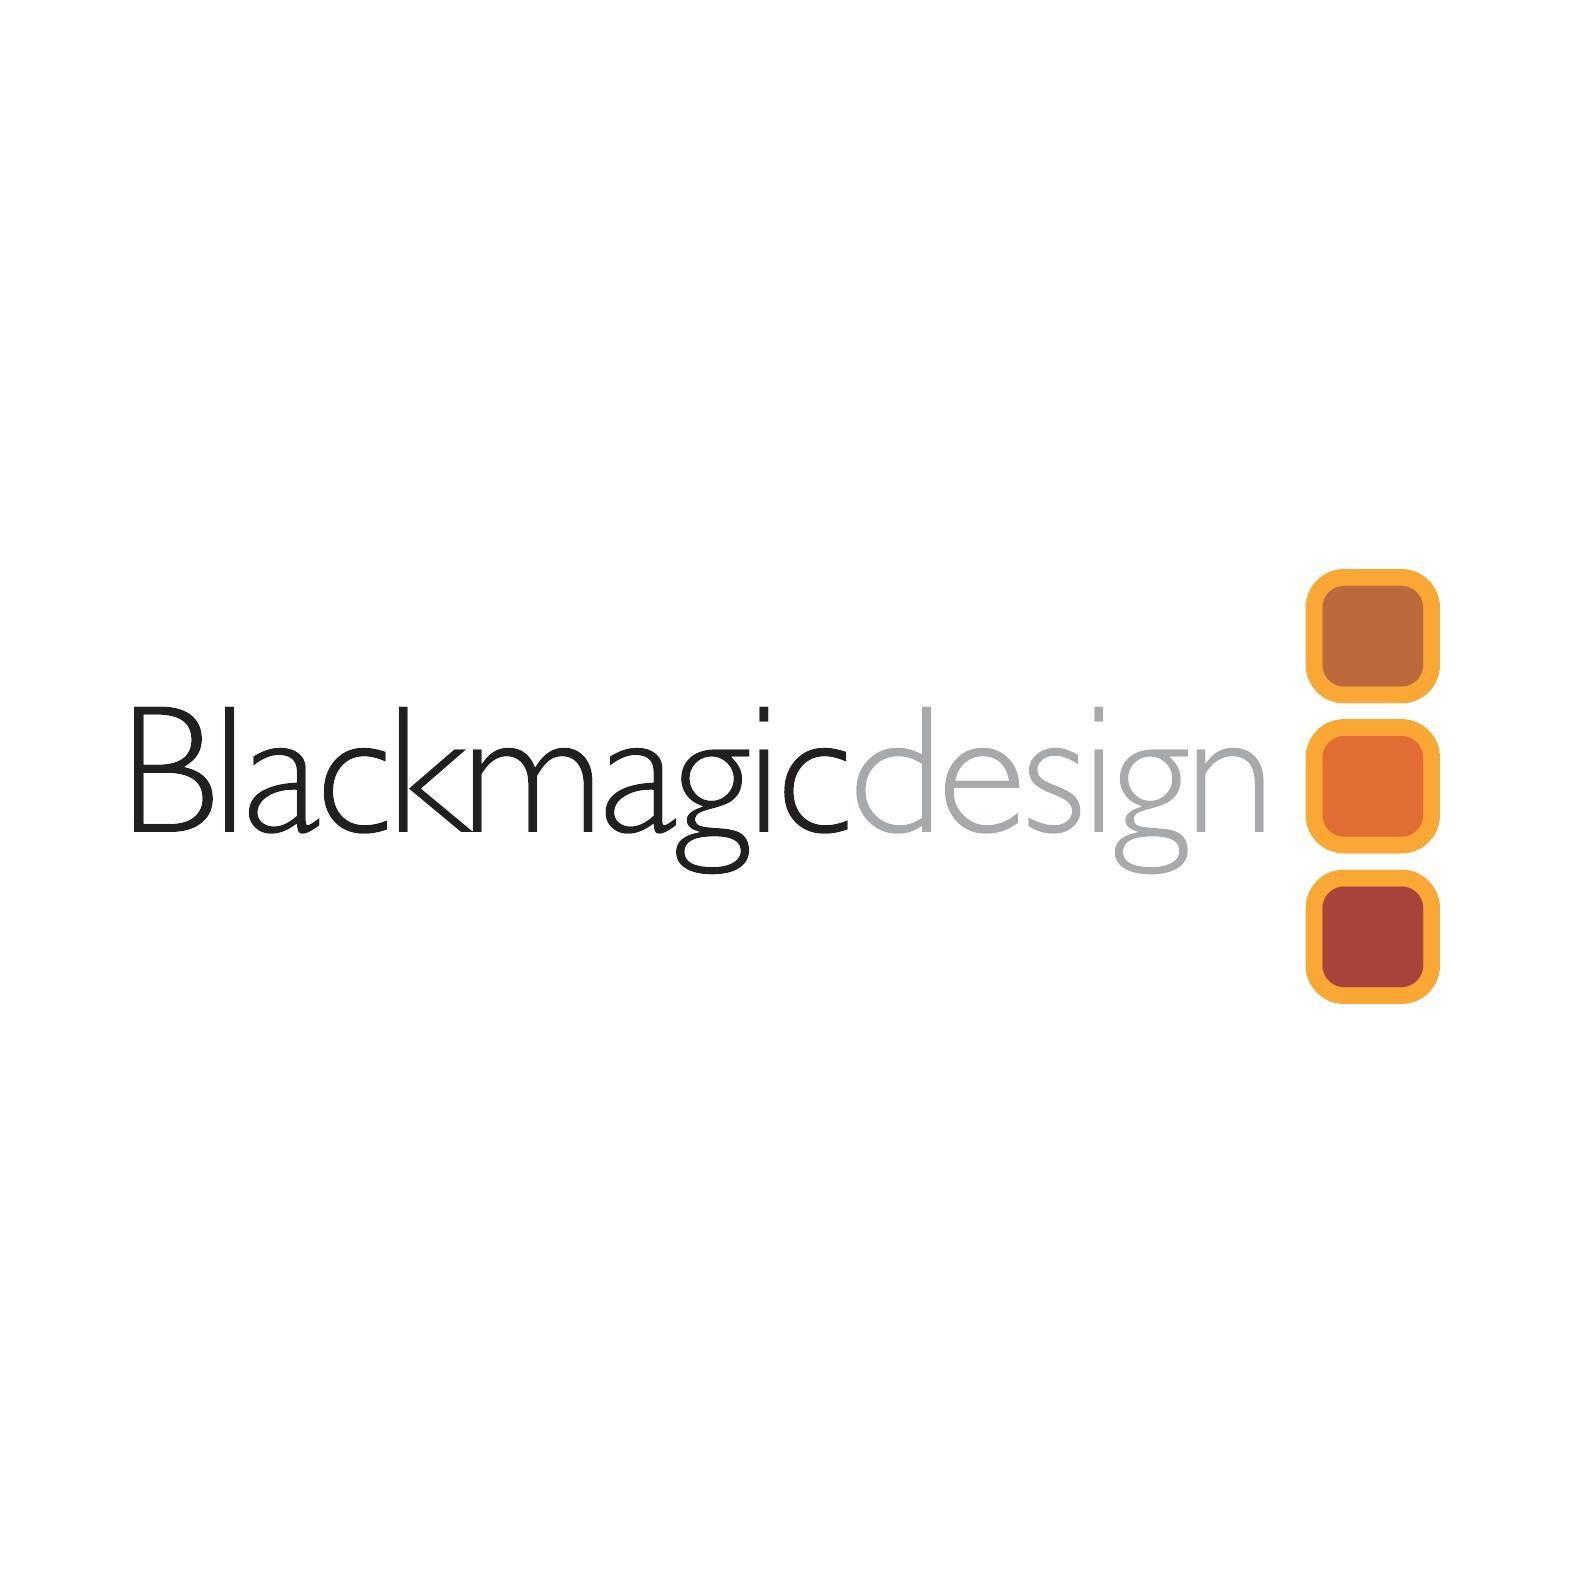 Blackmagic Design Asia Linkedin